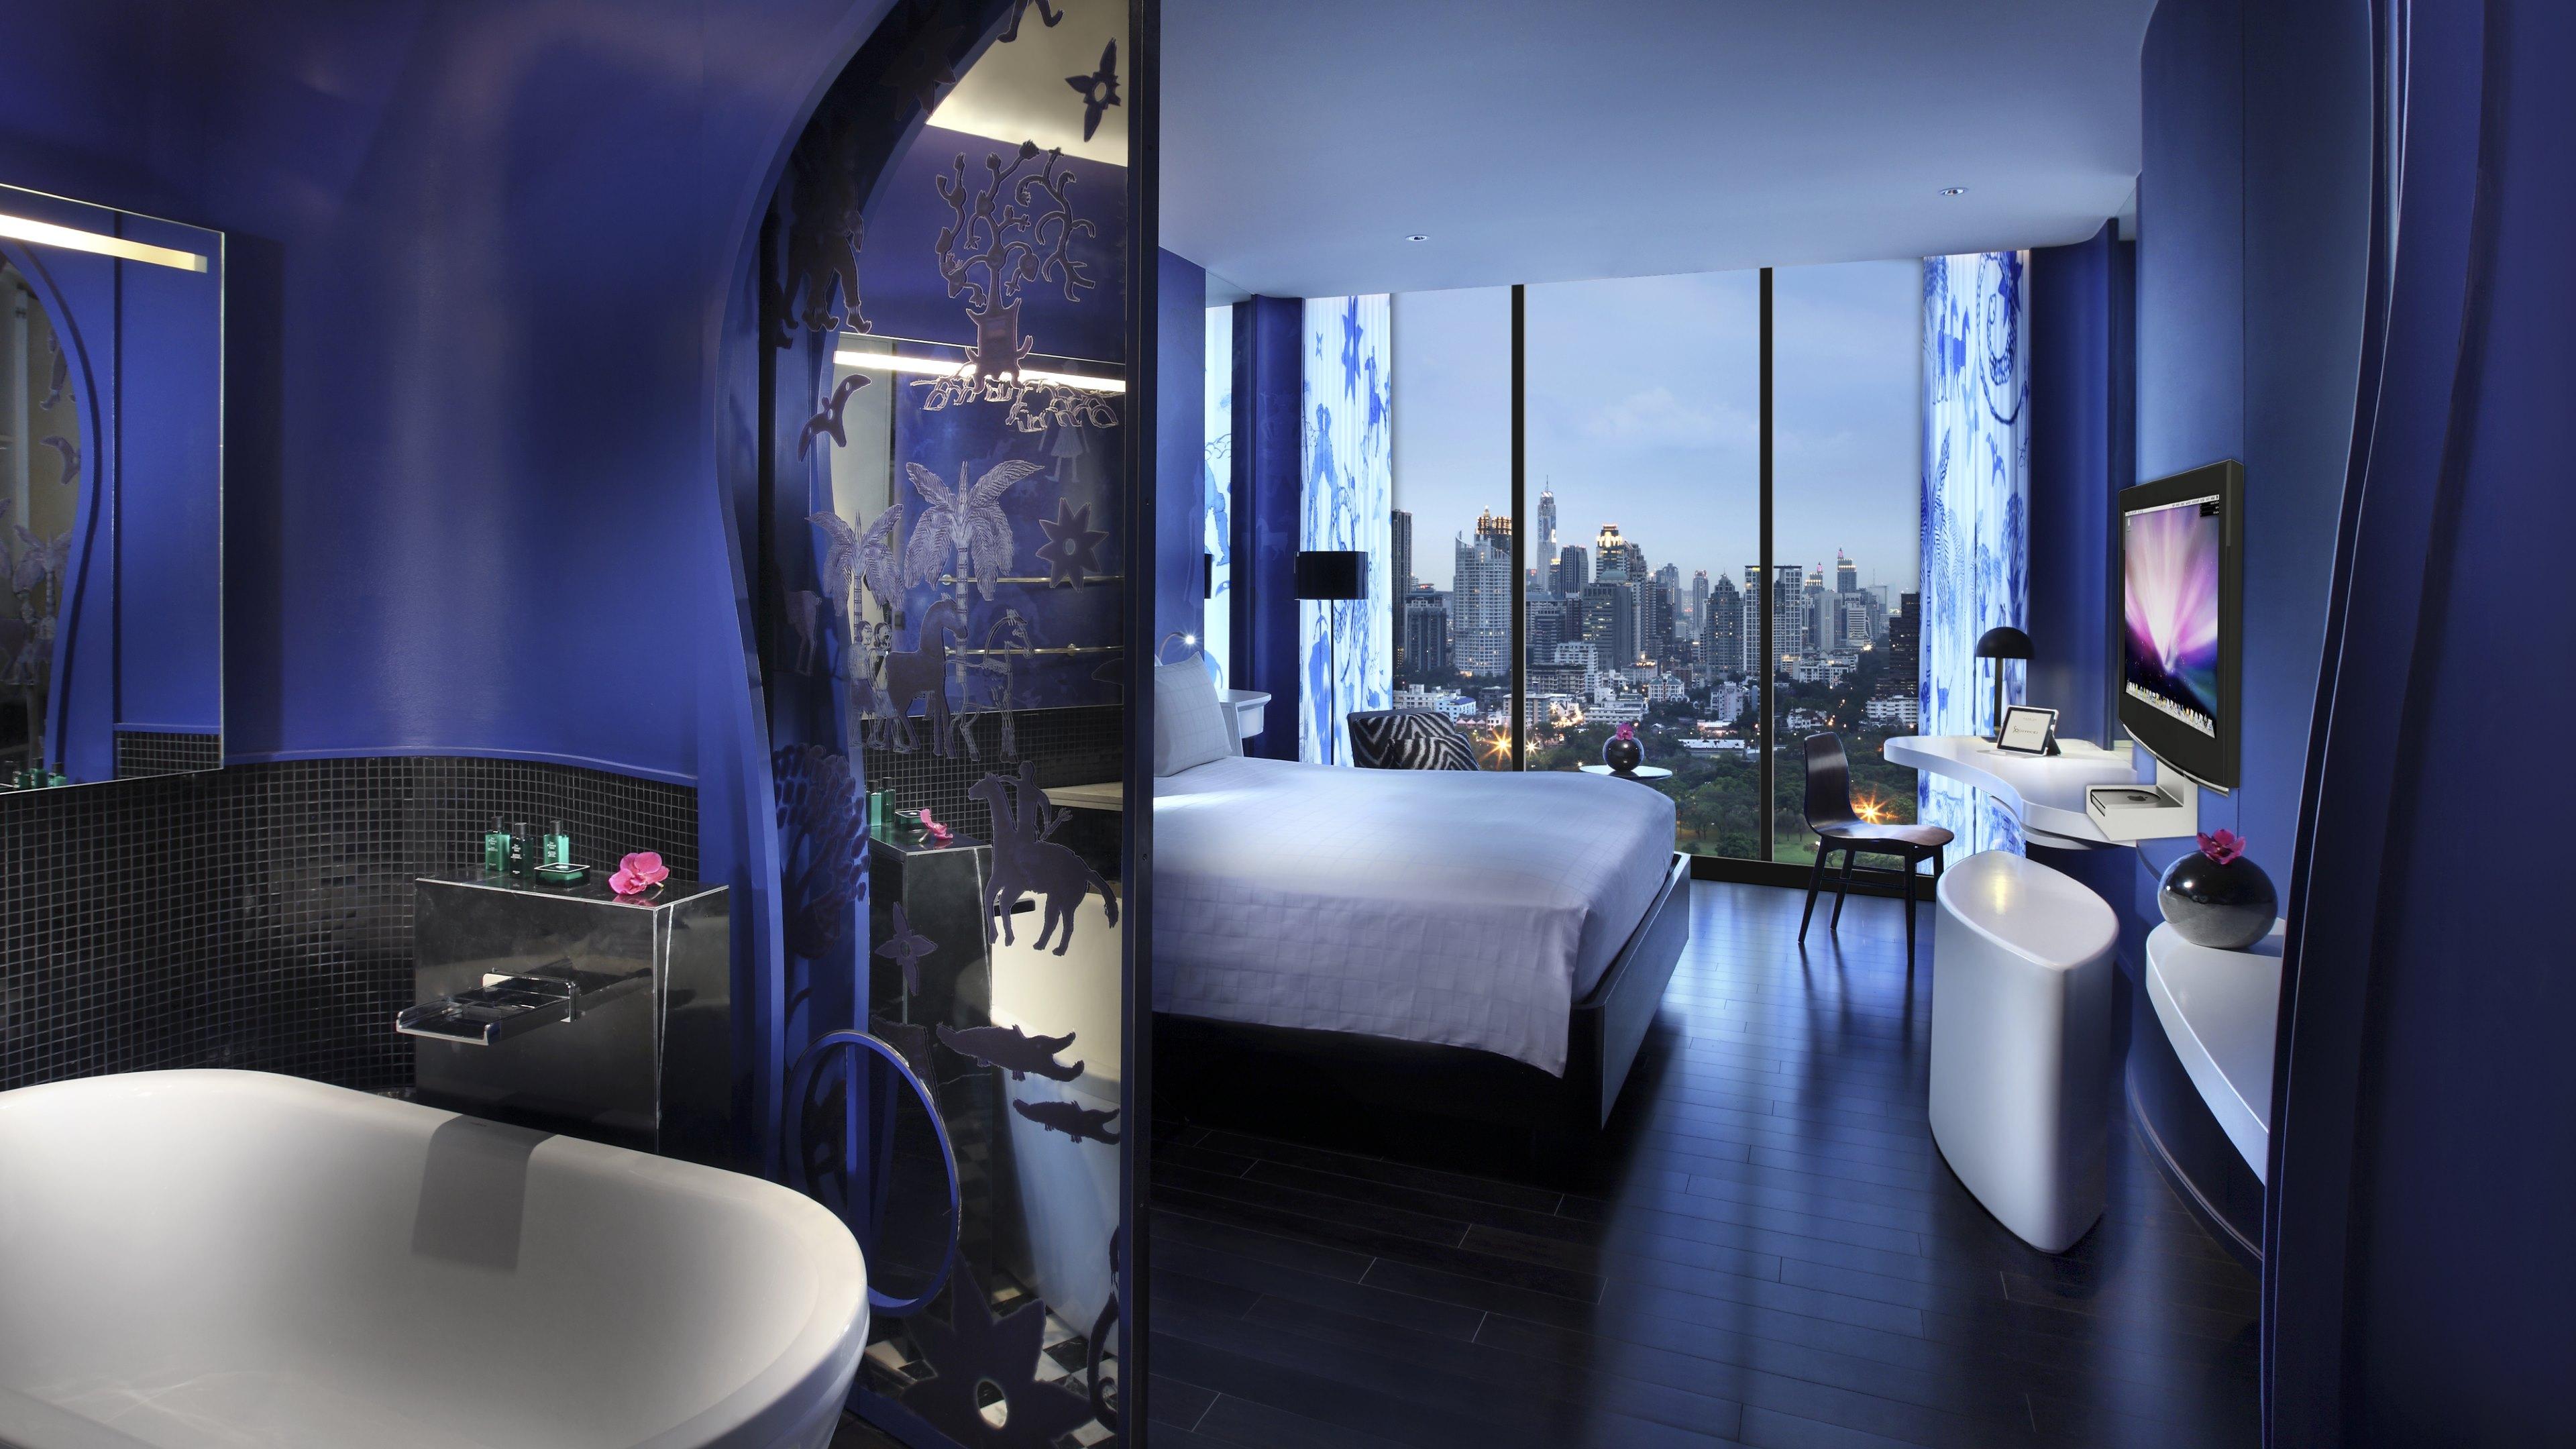 luxury interior design hd wallpapers 4k macbook and